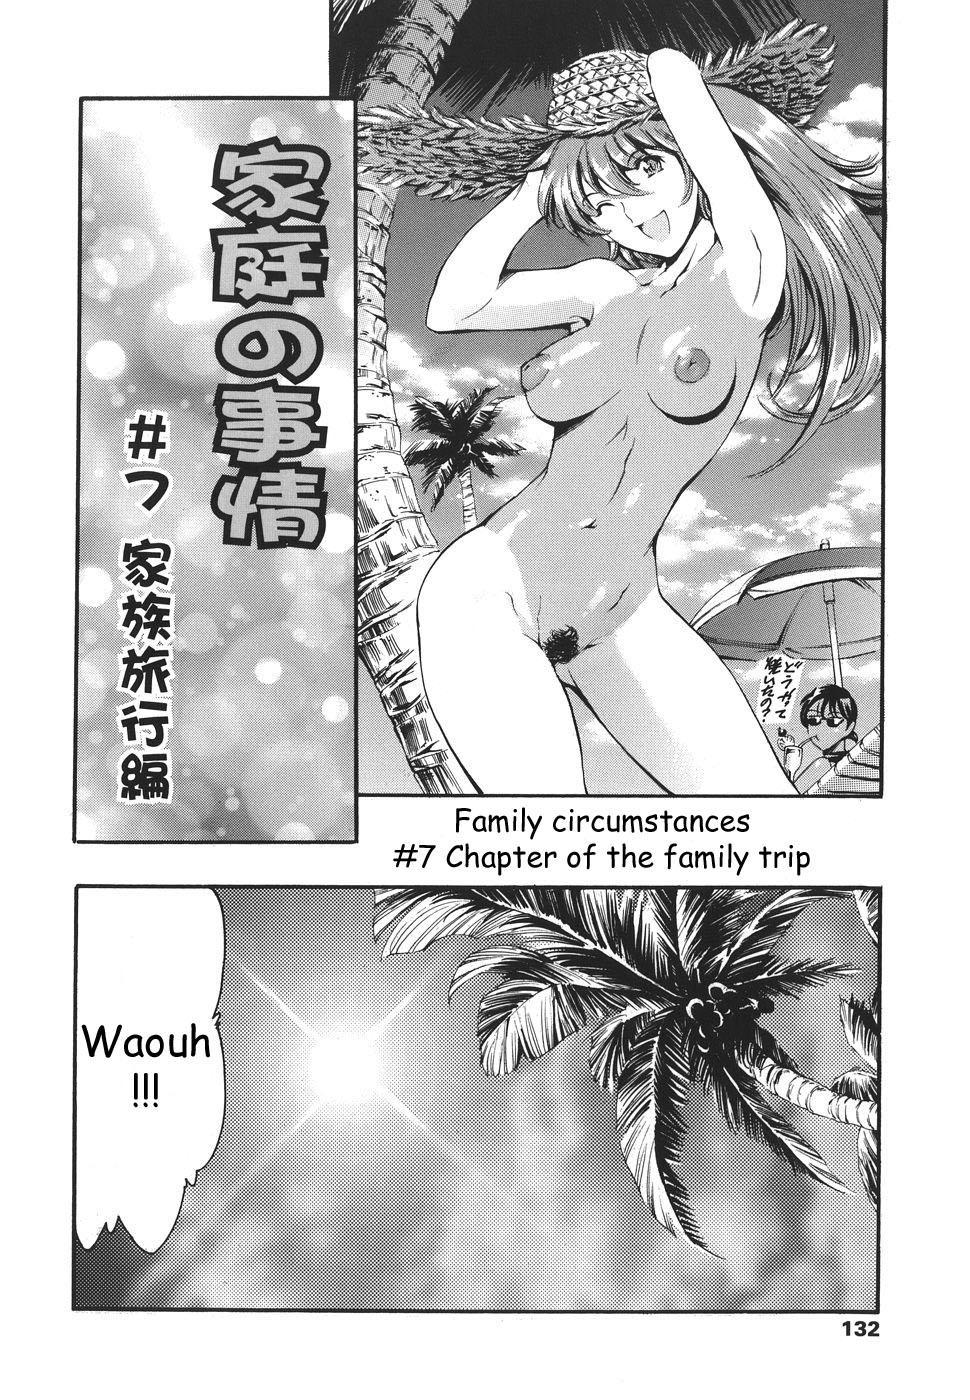 Katei no Jijou - Family's circumstances 126